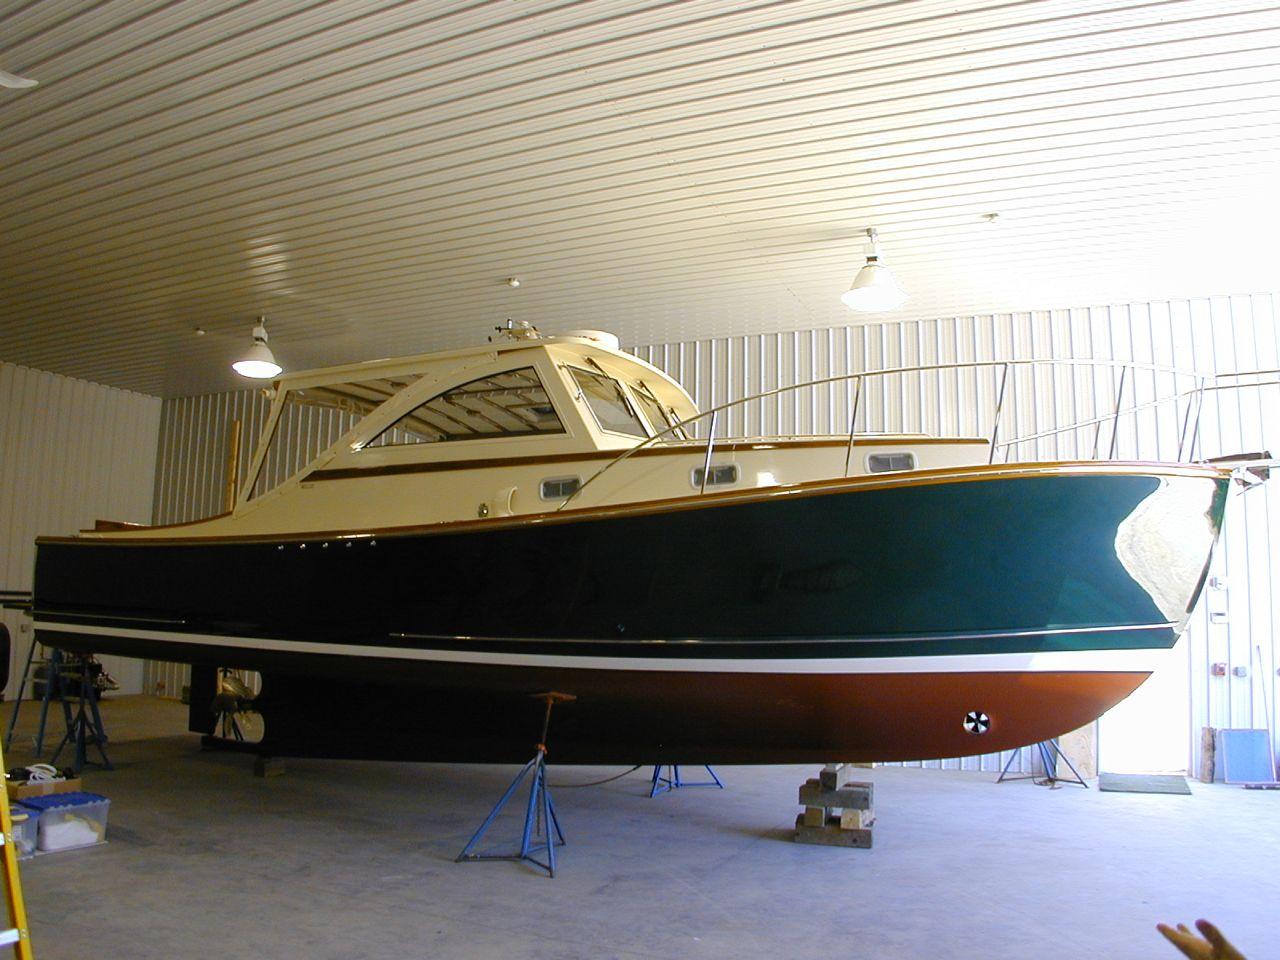 2004 Ellis 36 Express Cruiser for Sale